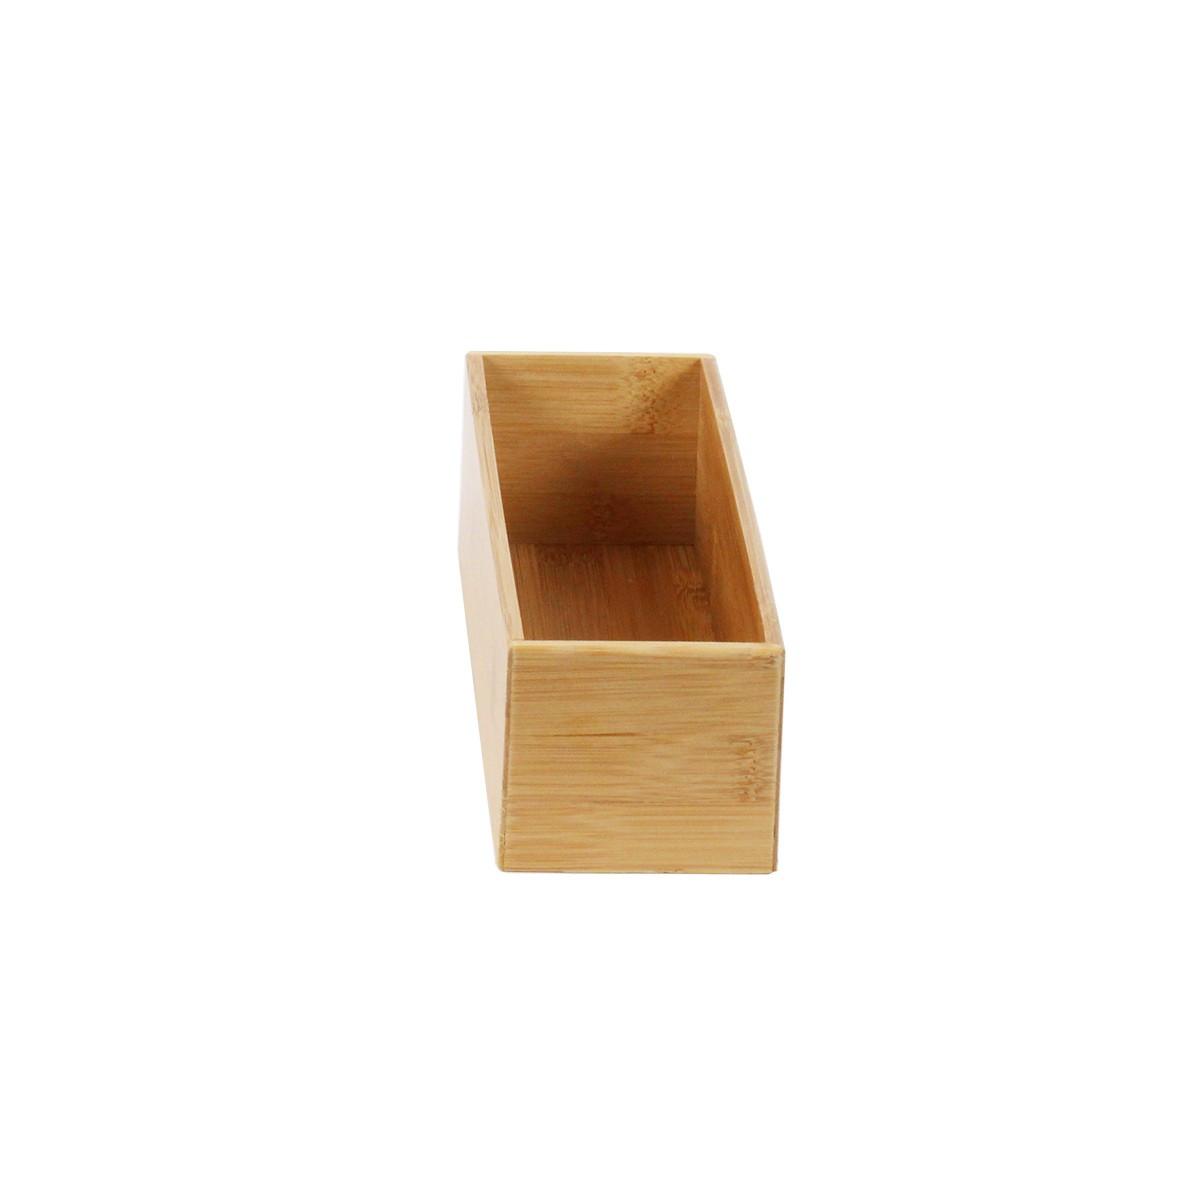 Bac en bambou organisation tiroirs cuisine for Organisateur tiroir cuisine